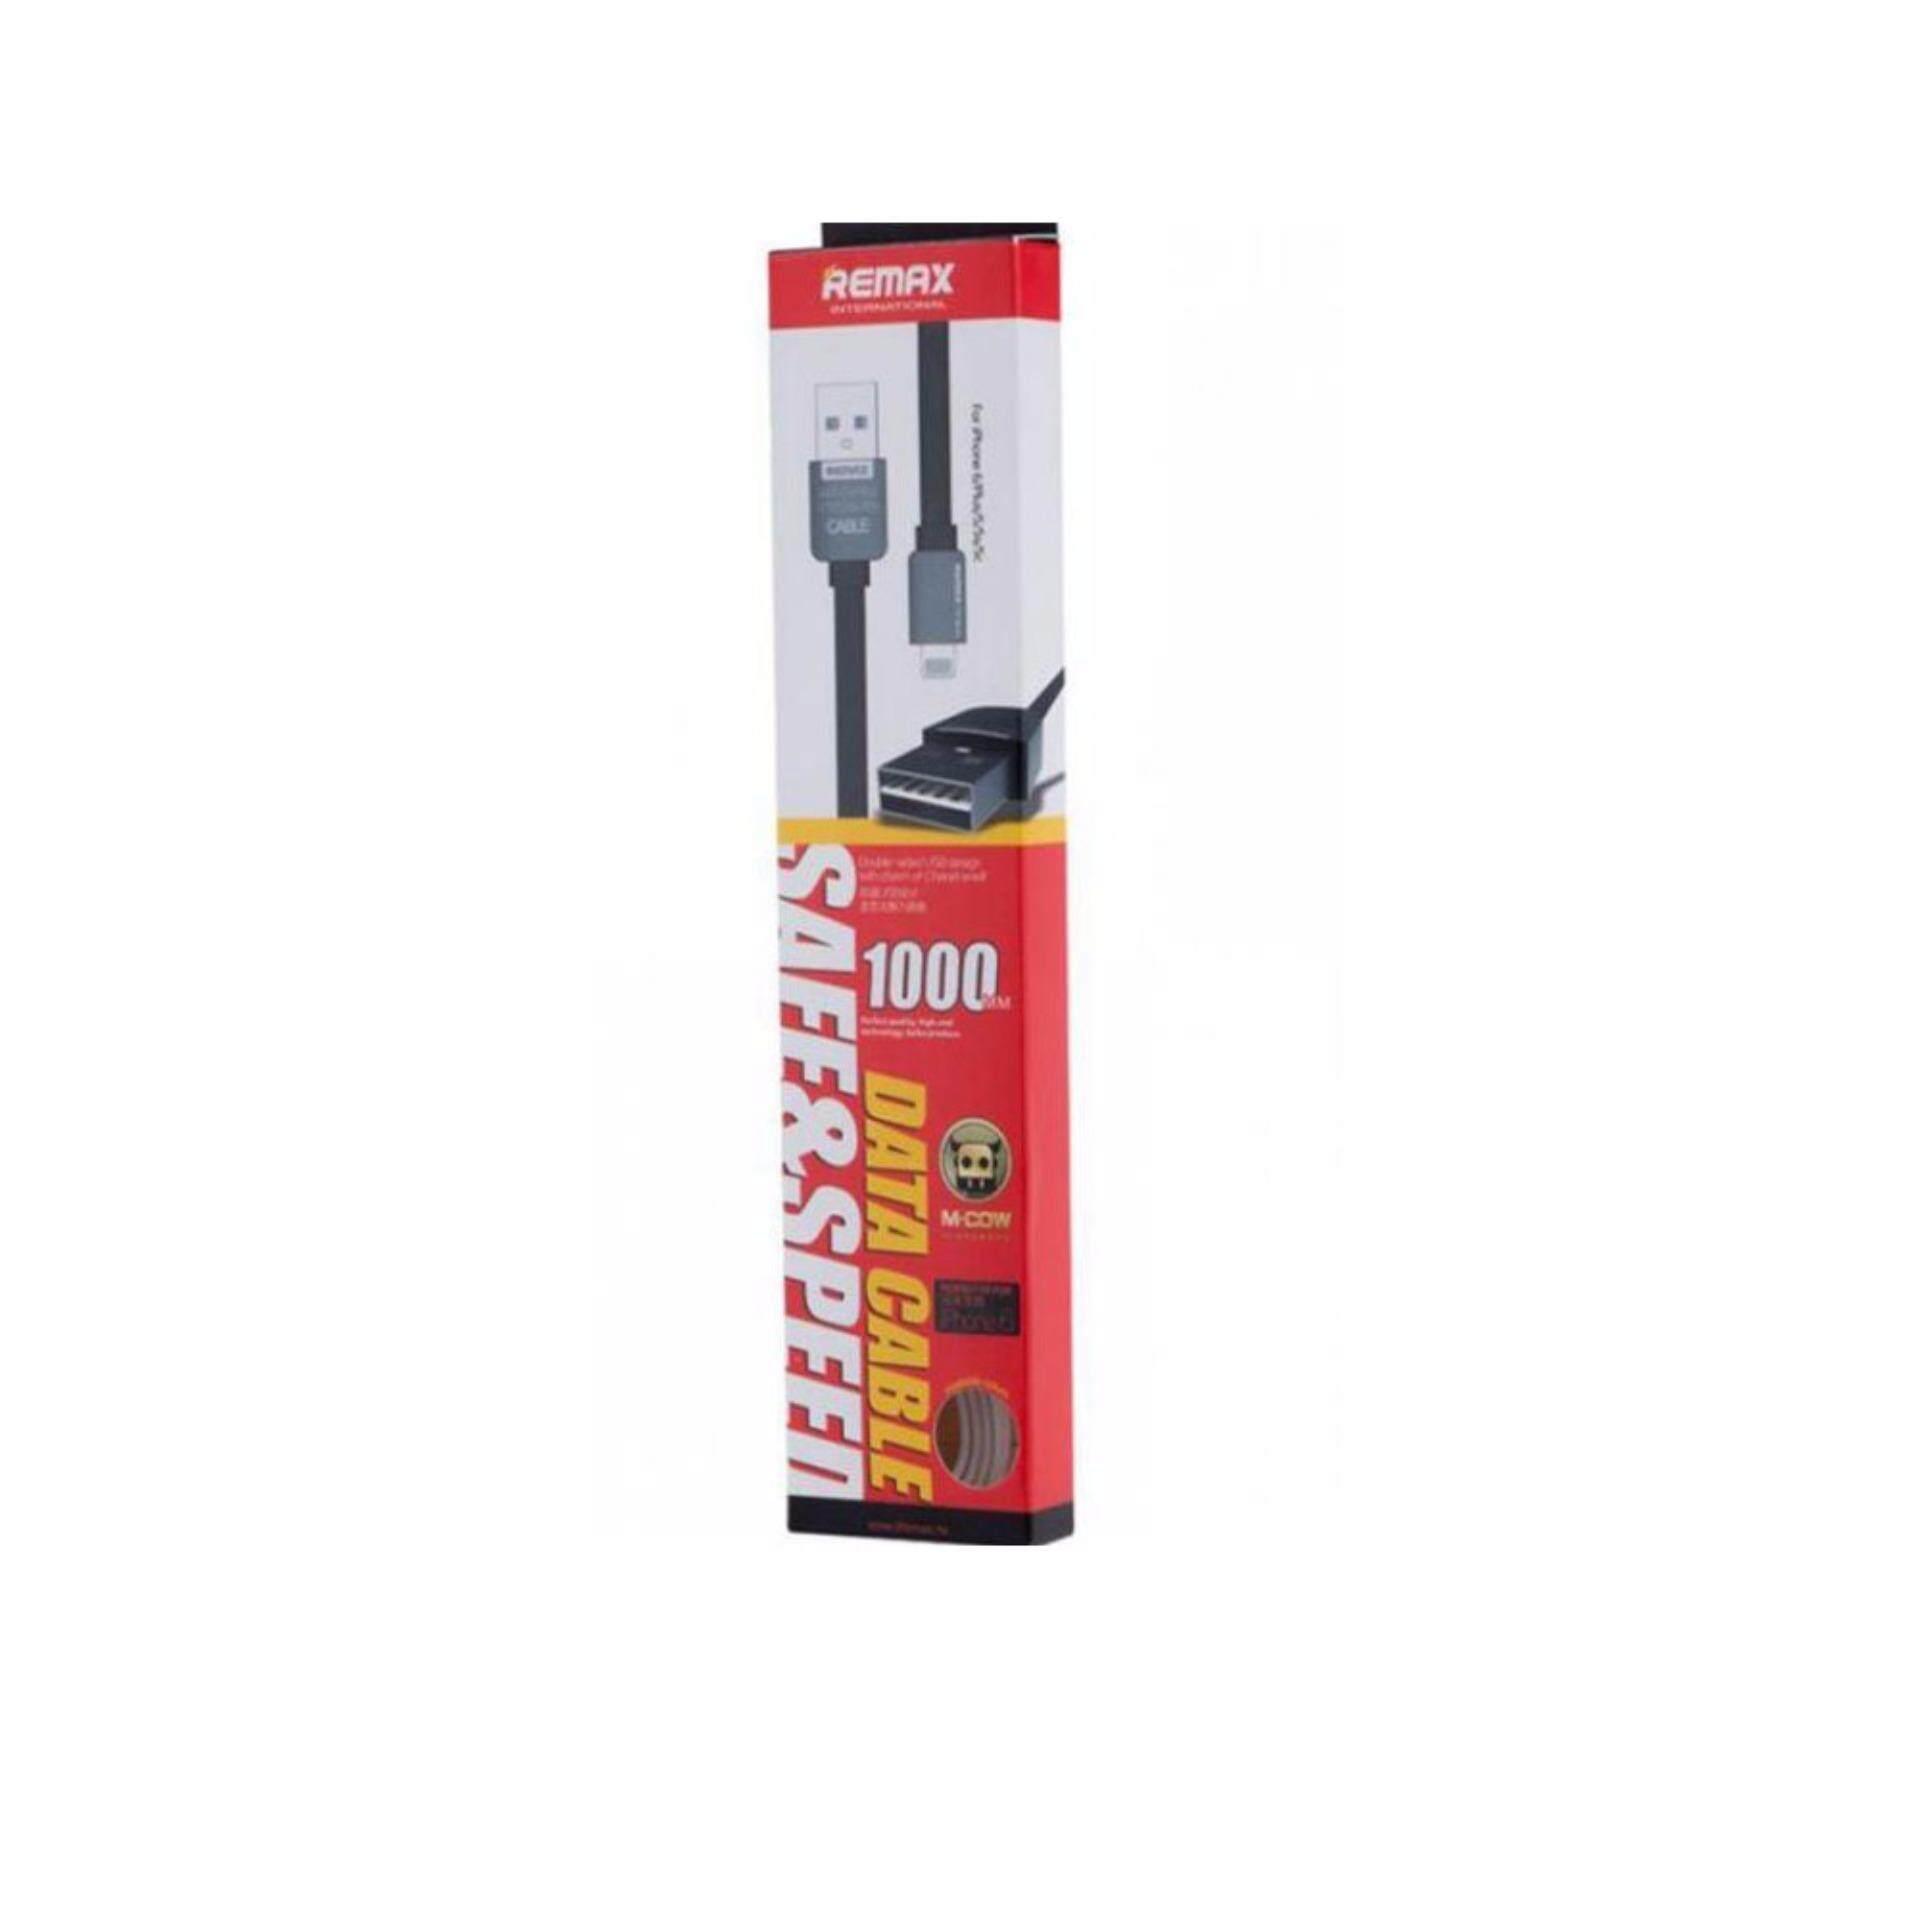 Remax RC-015i 1M for iPhone 6/ Plus/5/5s/5c